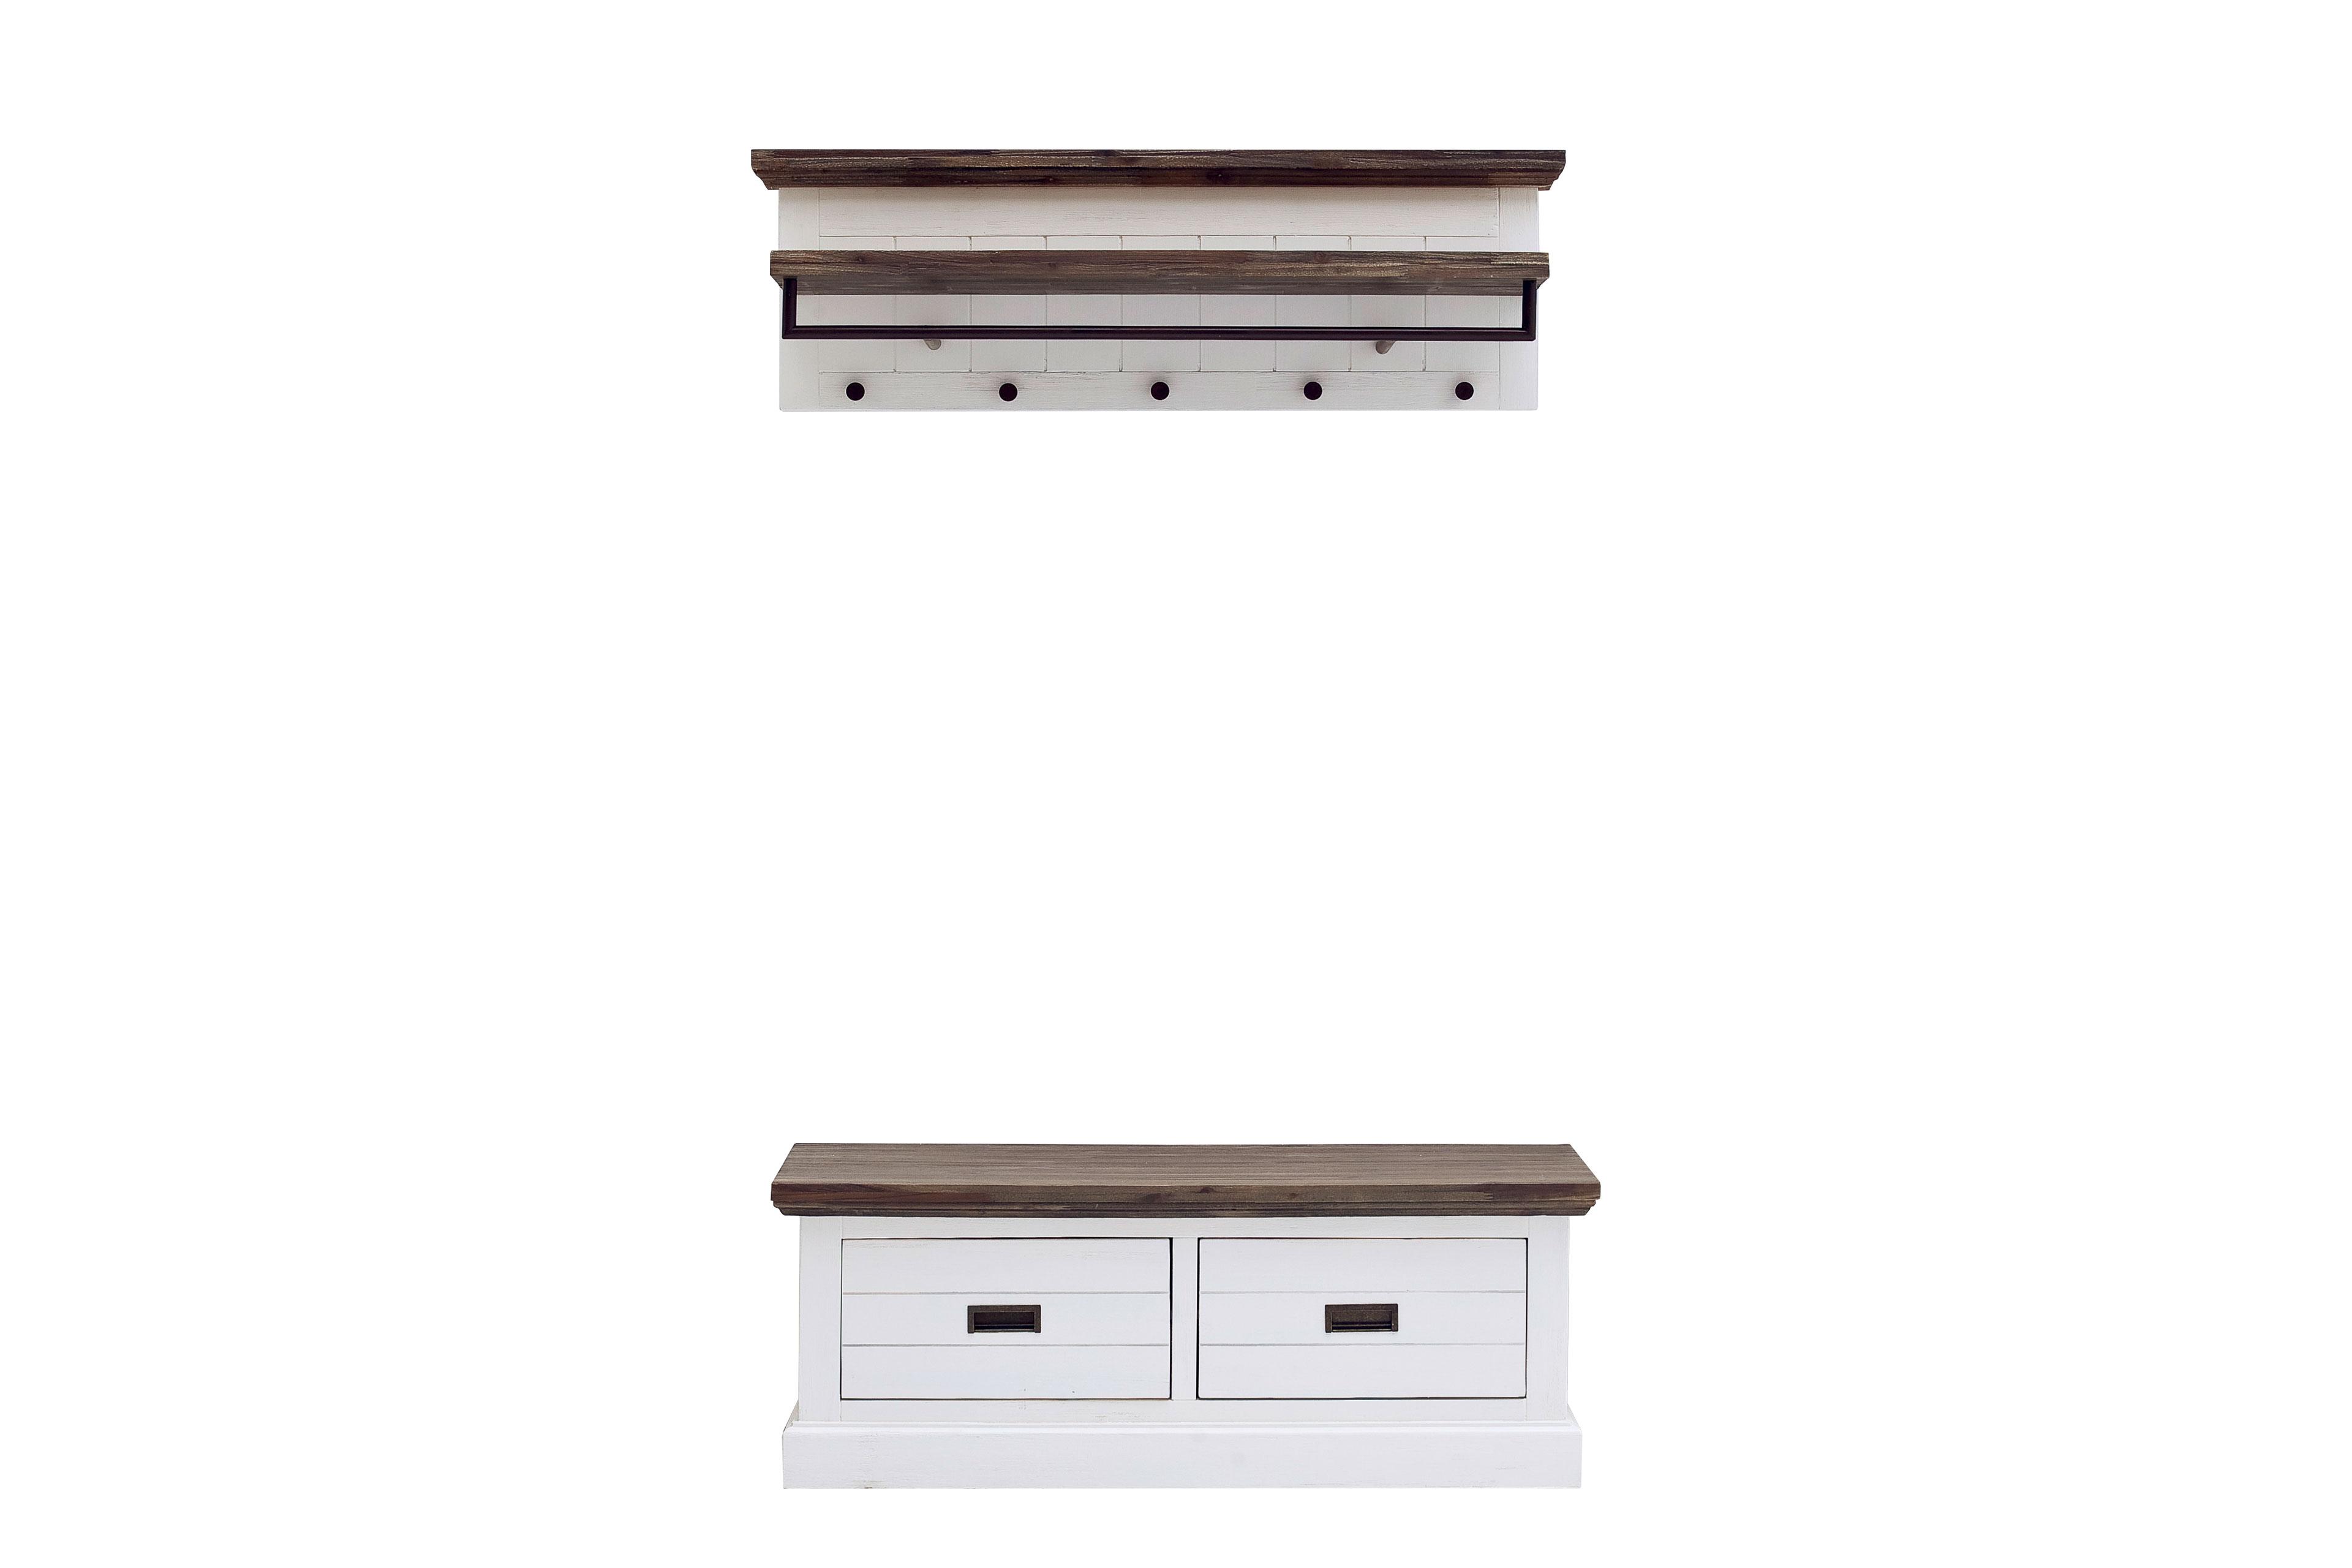 garderobe gomera gesine gom07k04 mca furniture m bel. Black Bedroom Furniture Sets. Home Design Ideas